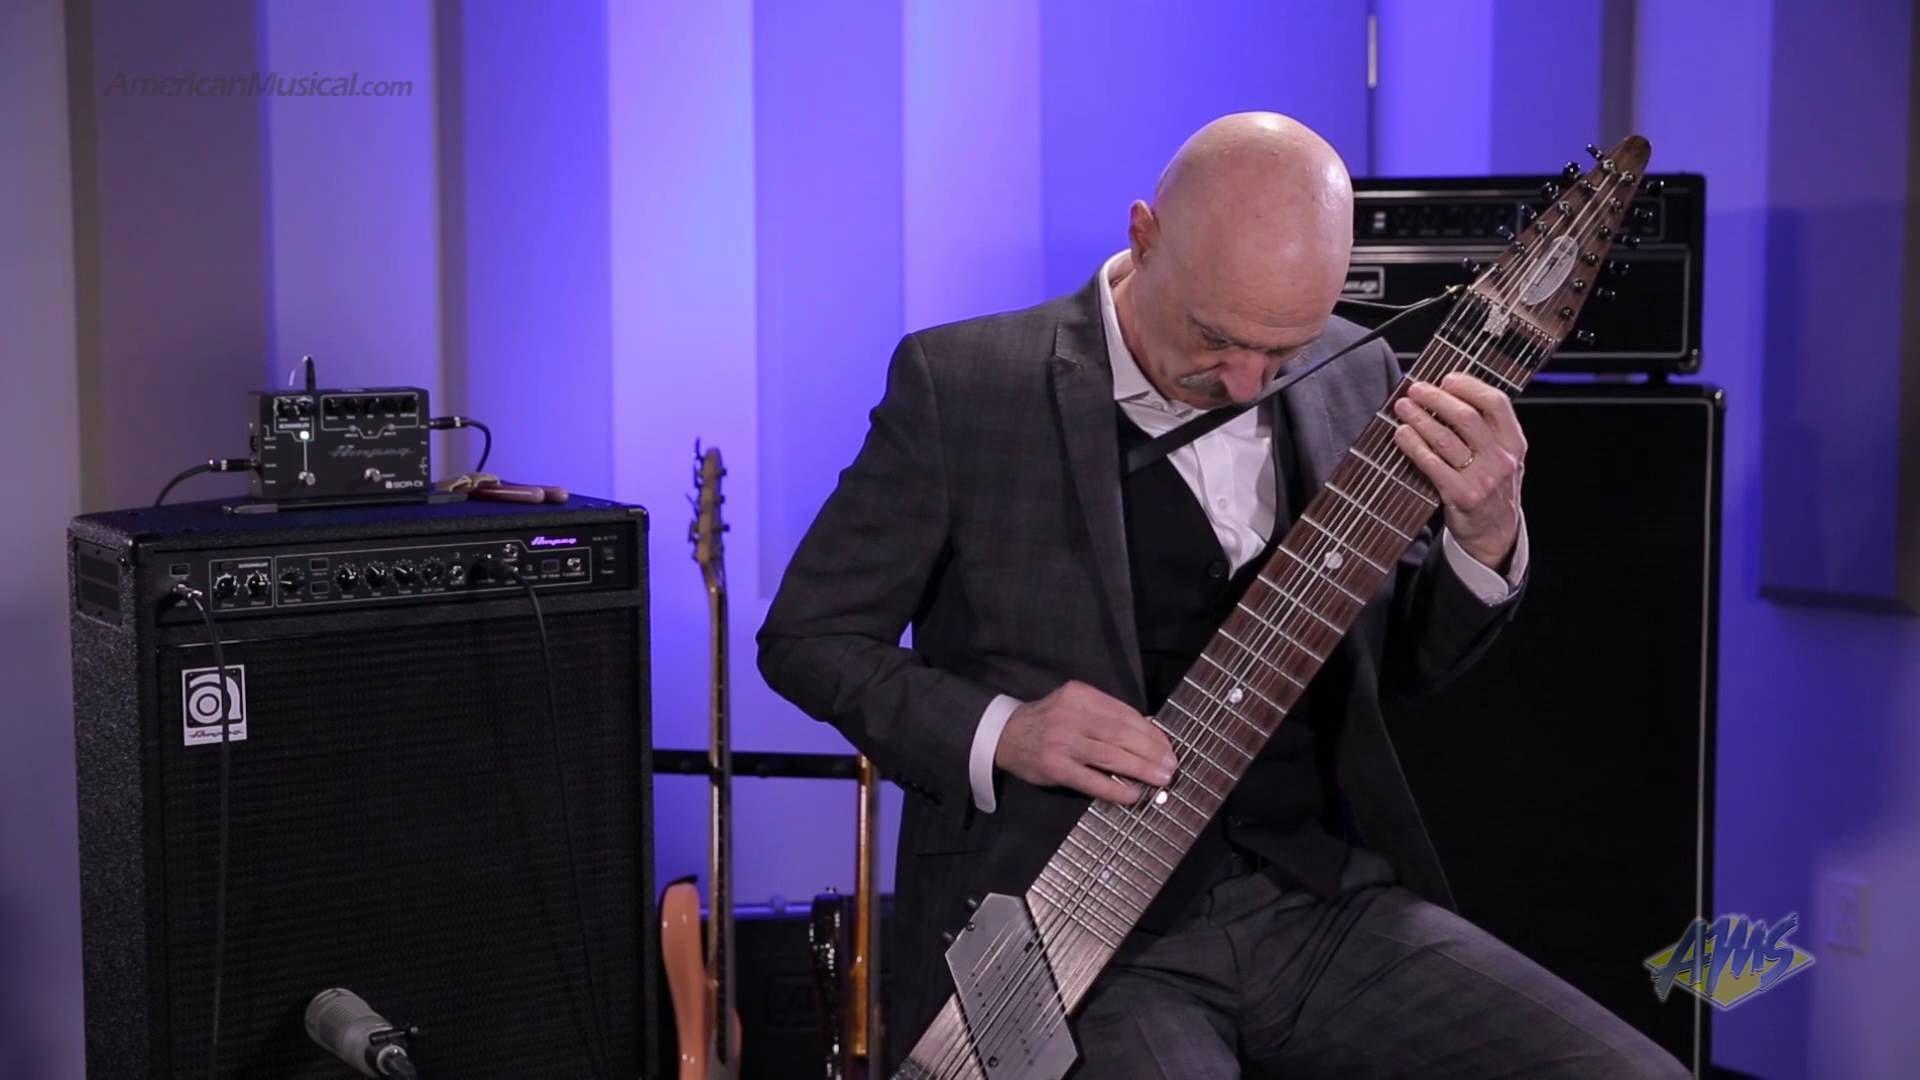 Ams Exclusive Tony Levin Bass Performance Chapman Stick